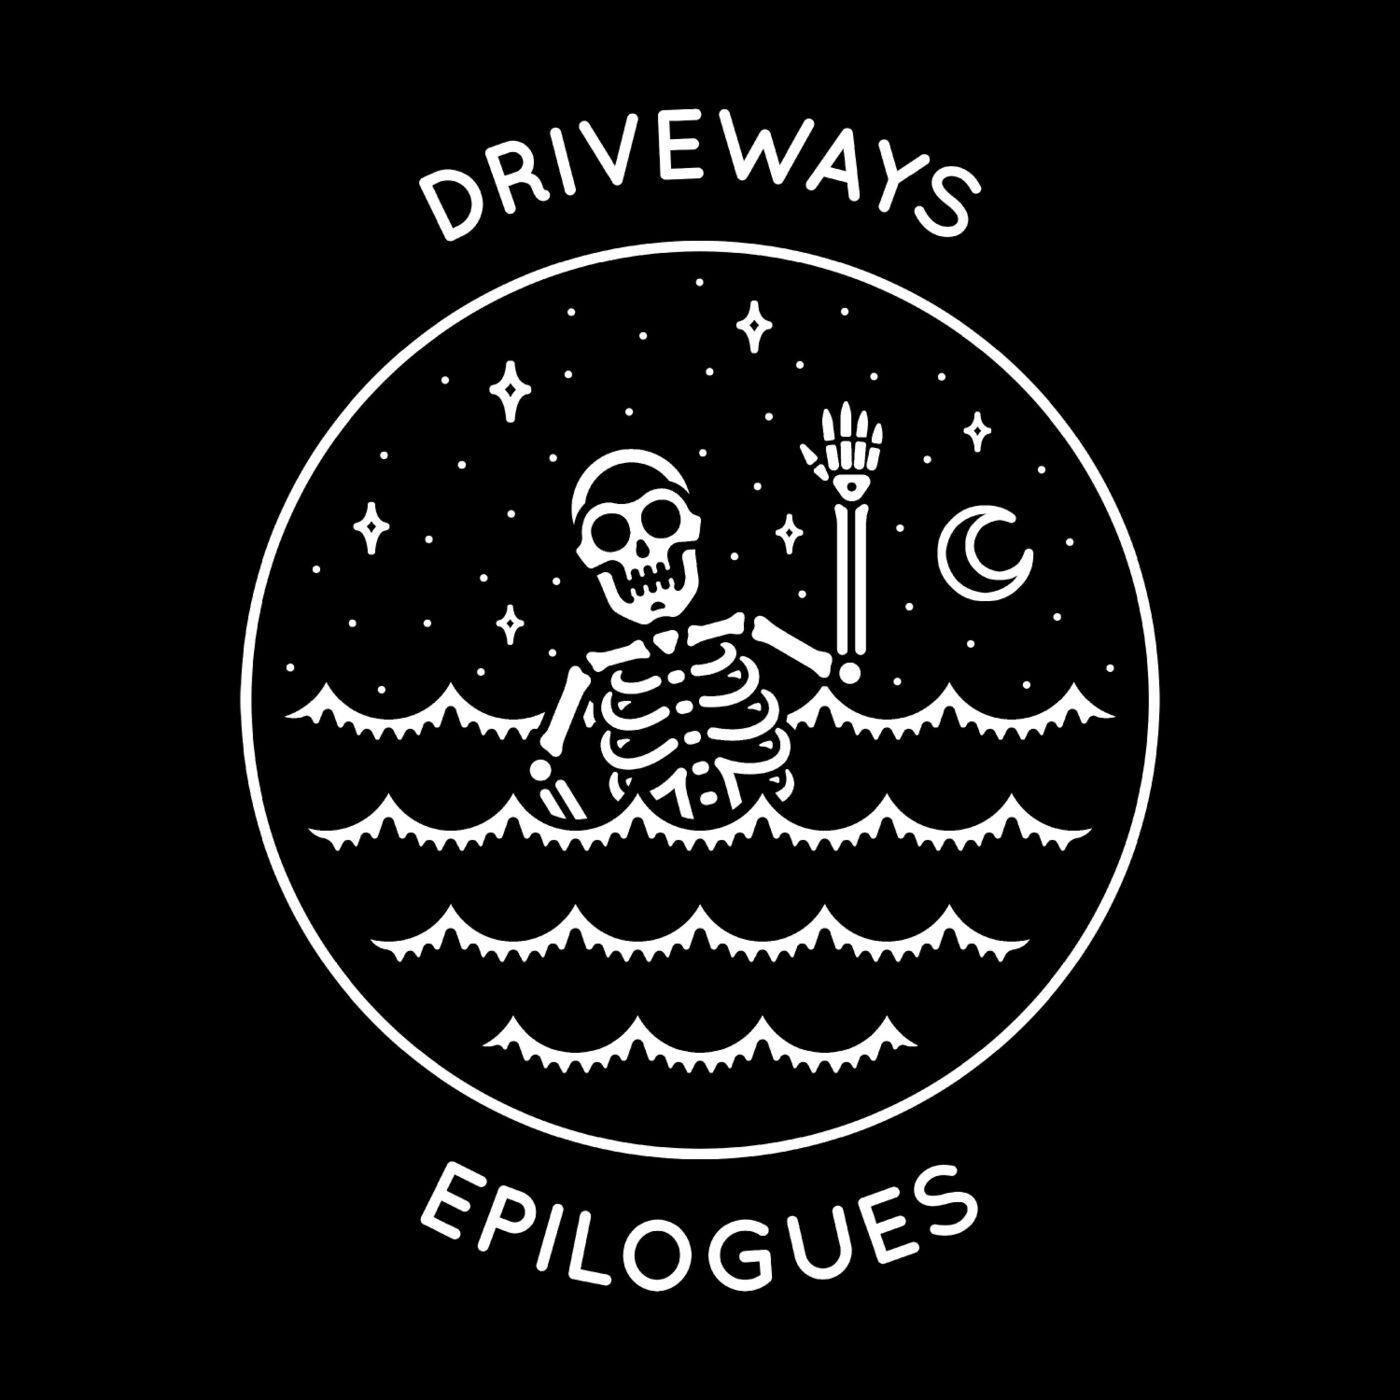 Driveways - Epilogues [EP] (2020)